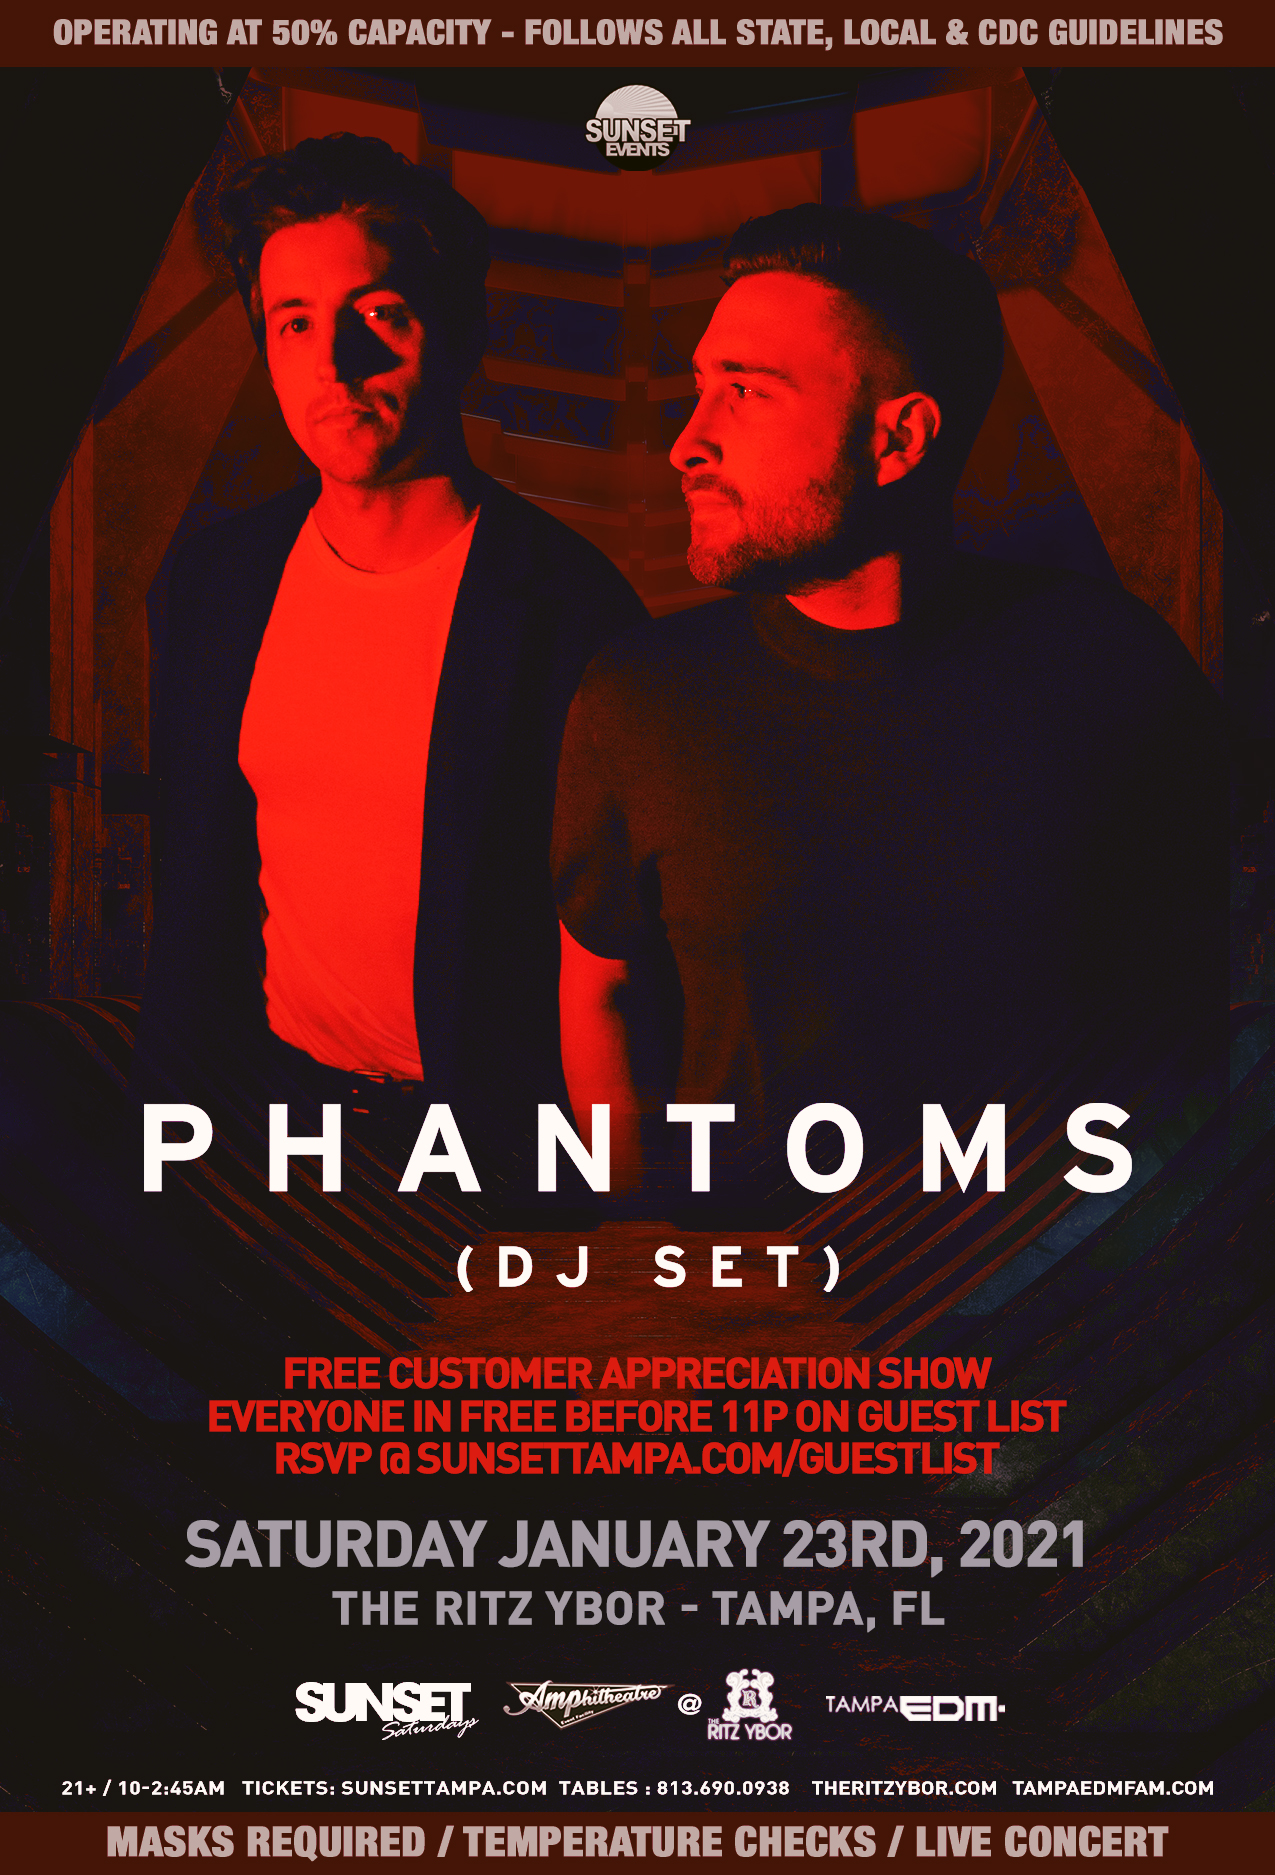 Phantoms (dj set) for Sunset Saturdays at The RITZ Ybor – 1/23/2021